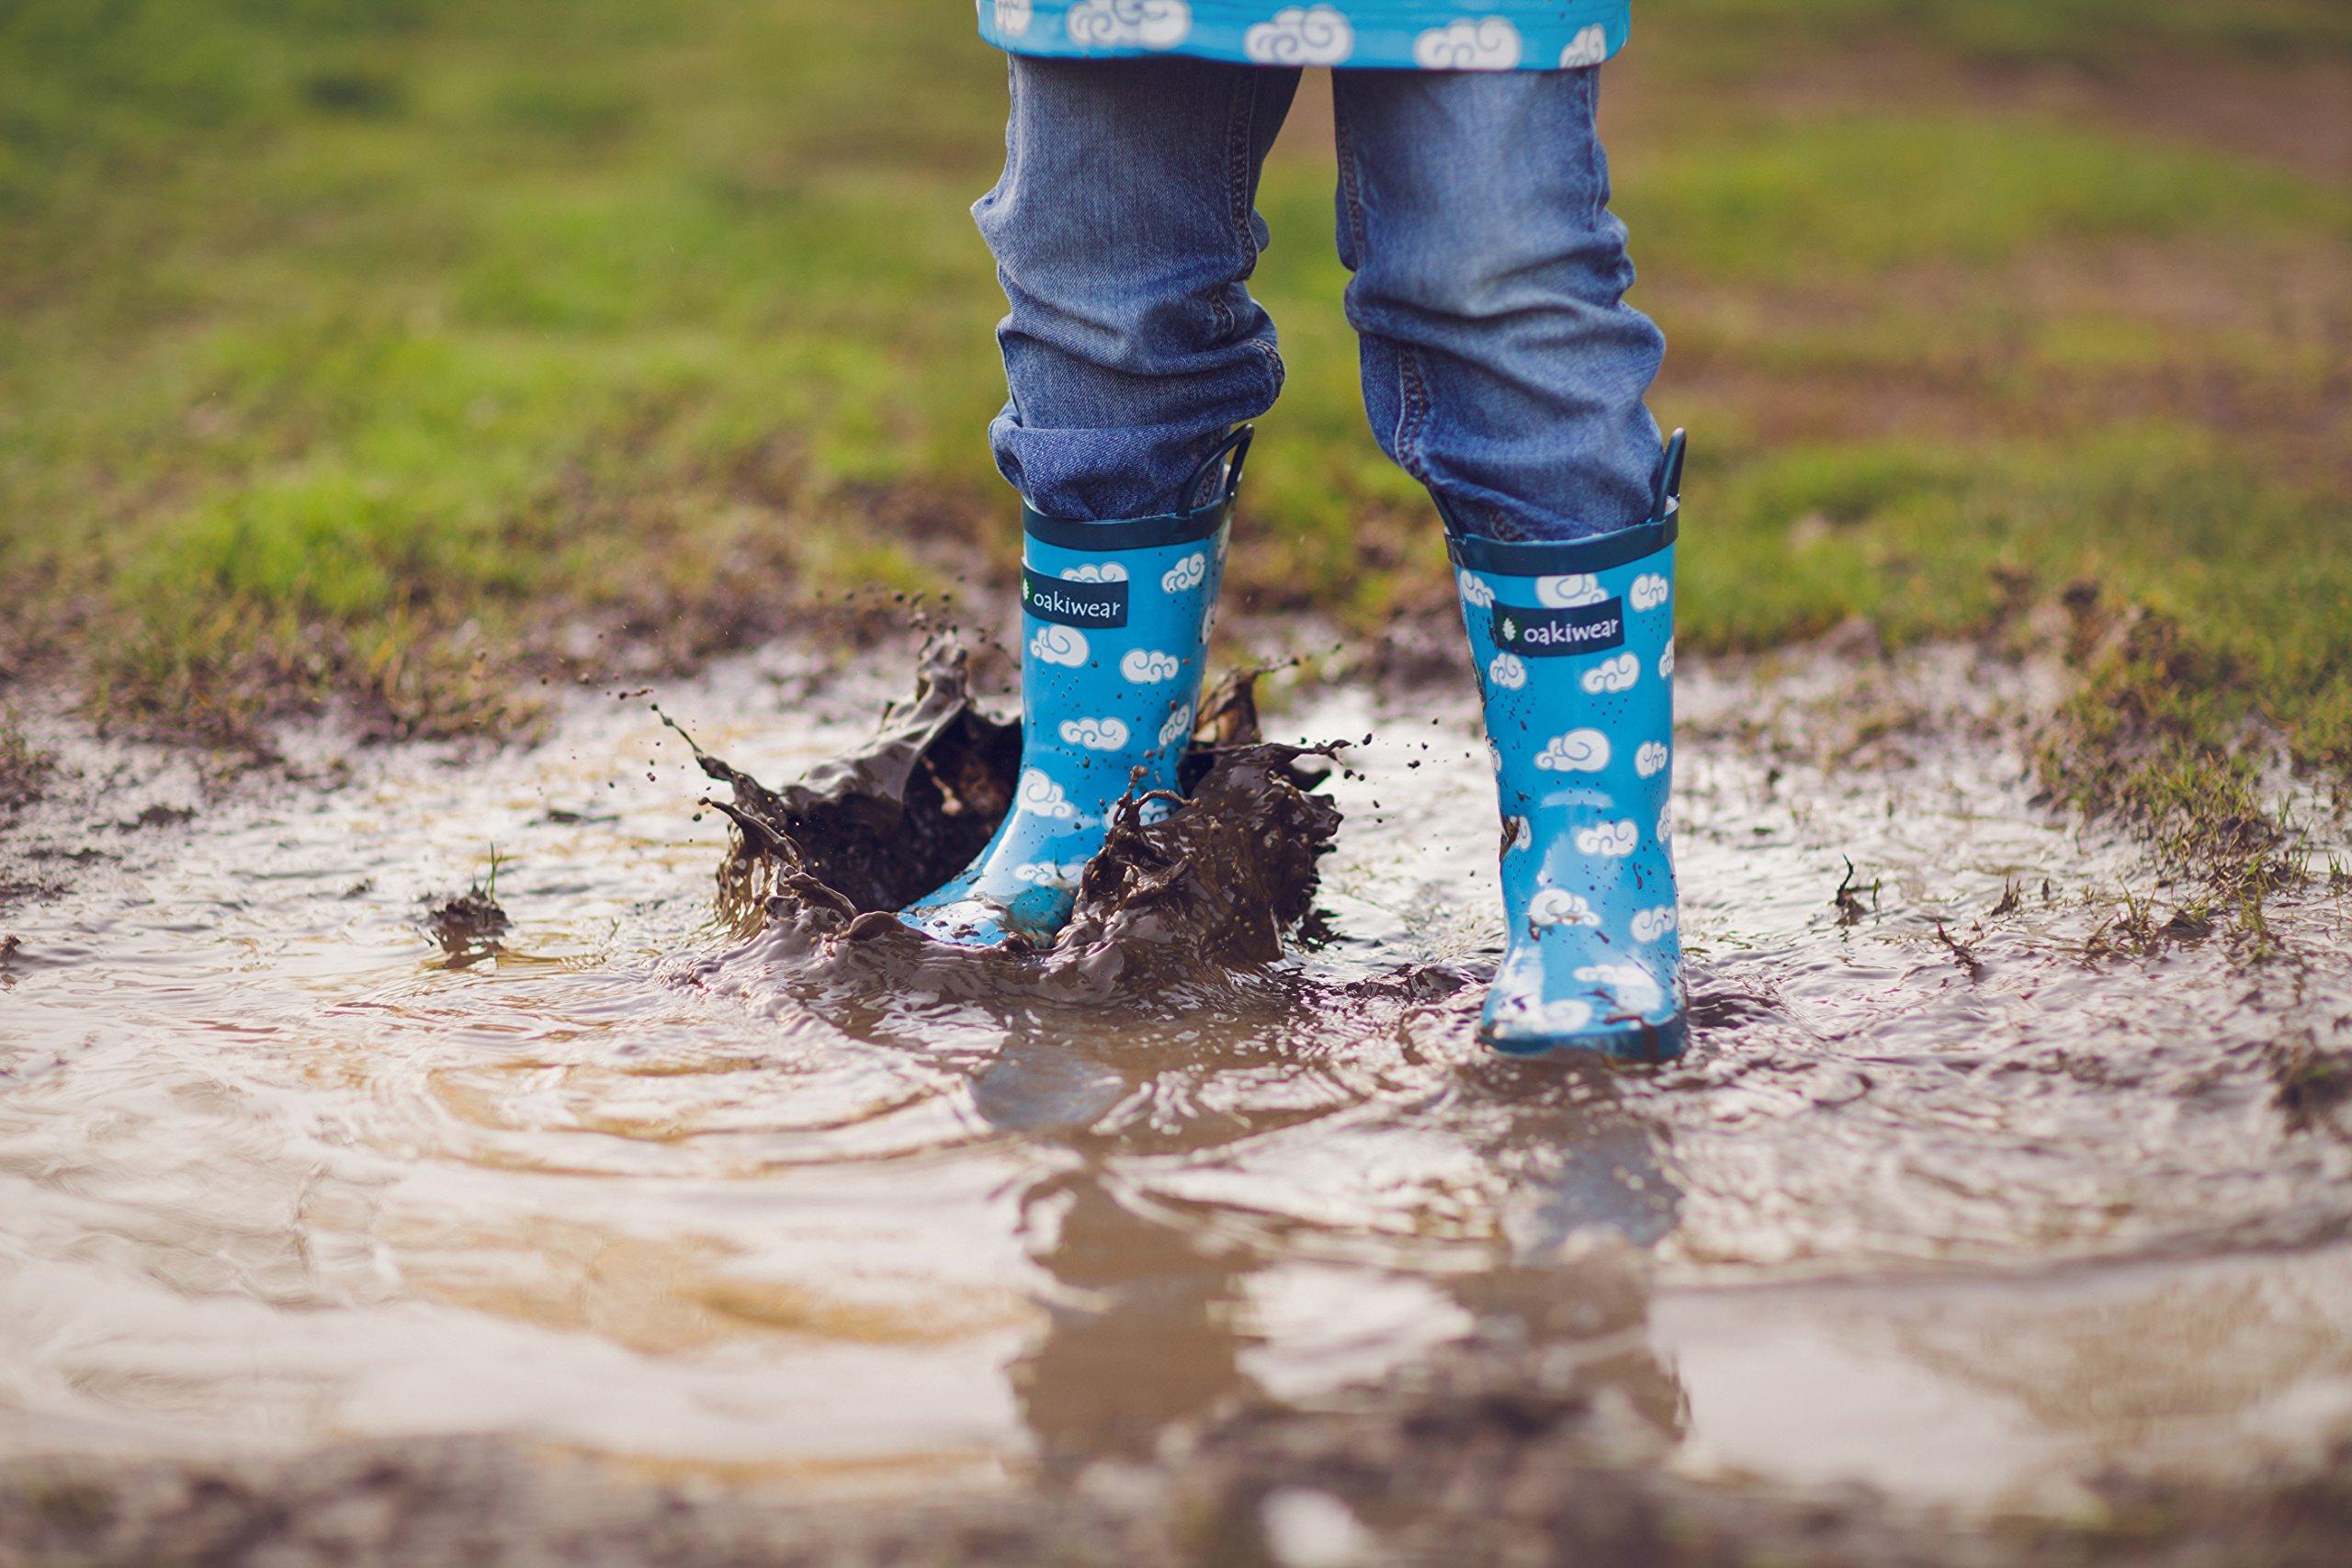 Oakiwear Kids Rubber Rain Boots with Easy-On Handles, Clouds, 9T US Toddler by Oakiwear (Image #6)